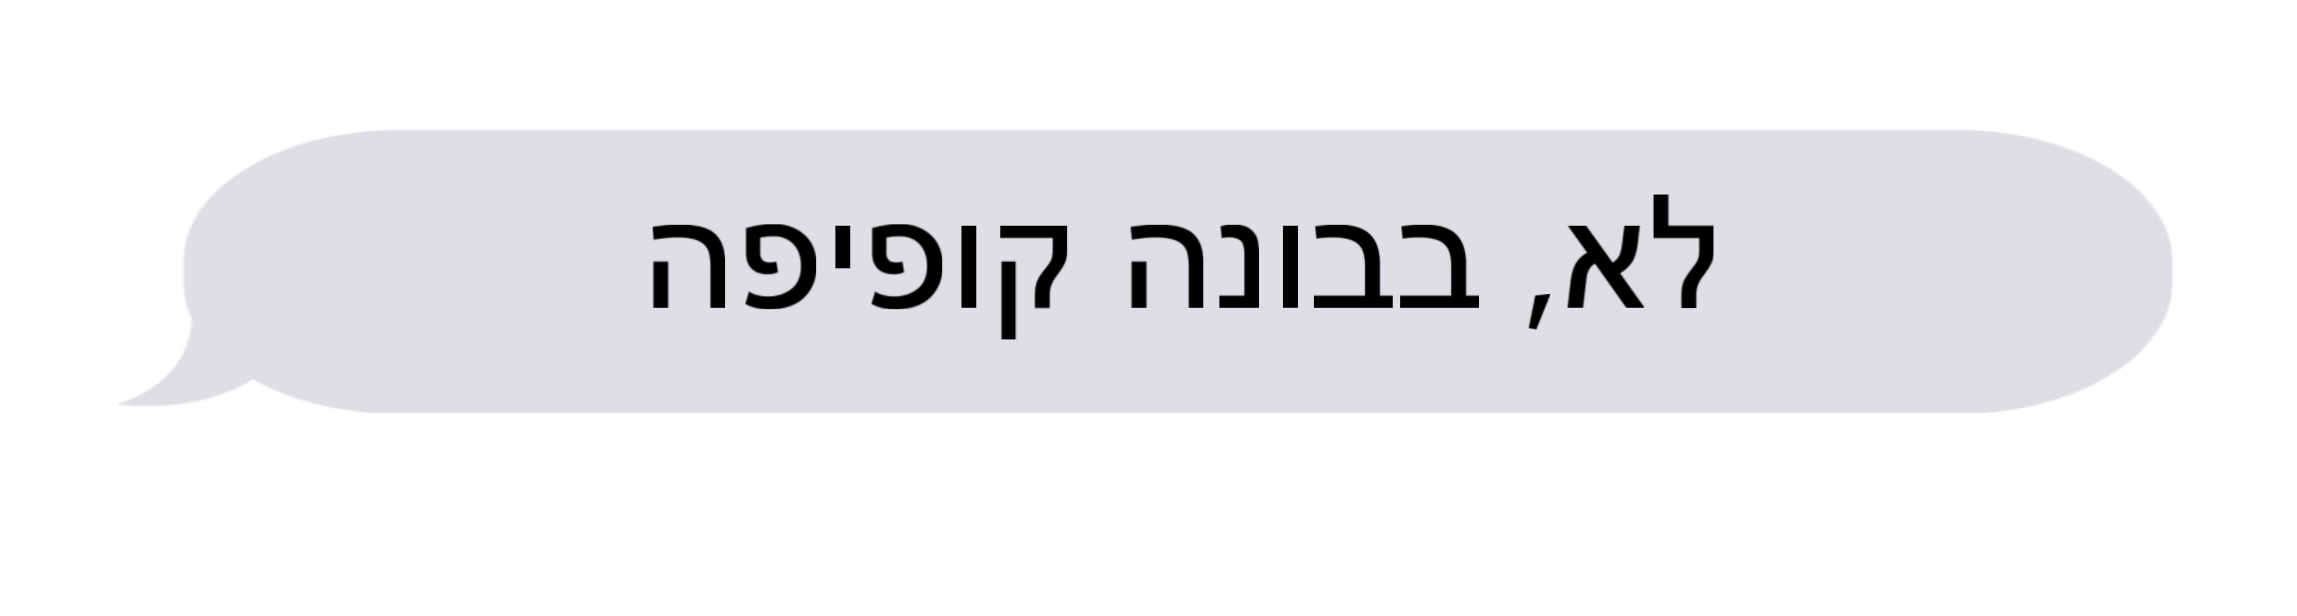 #hebrew #freetoedit